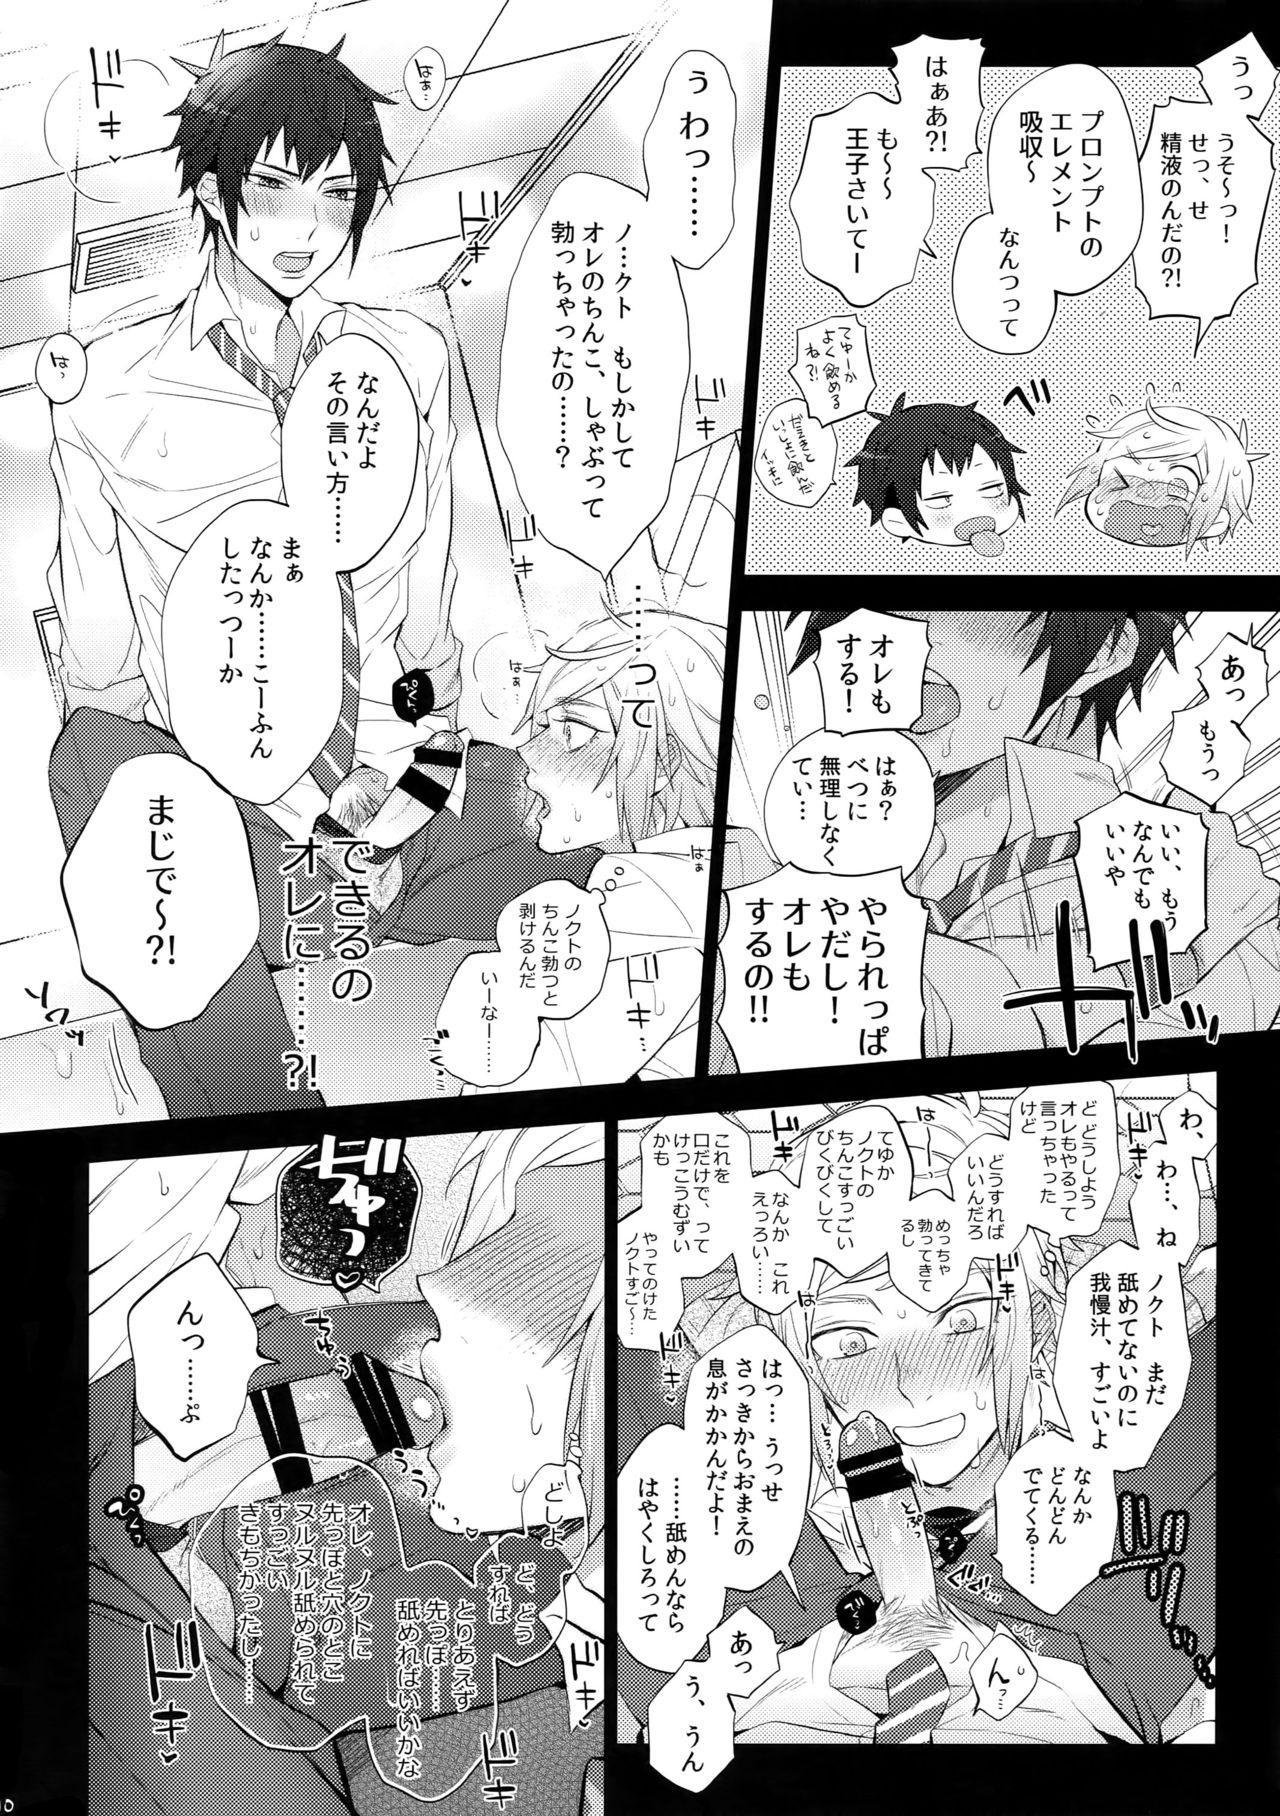 Yuri Kiss 2 8